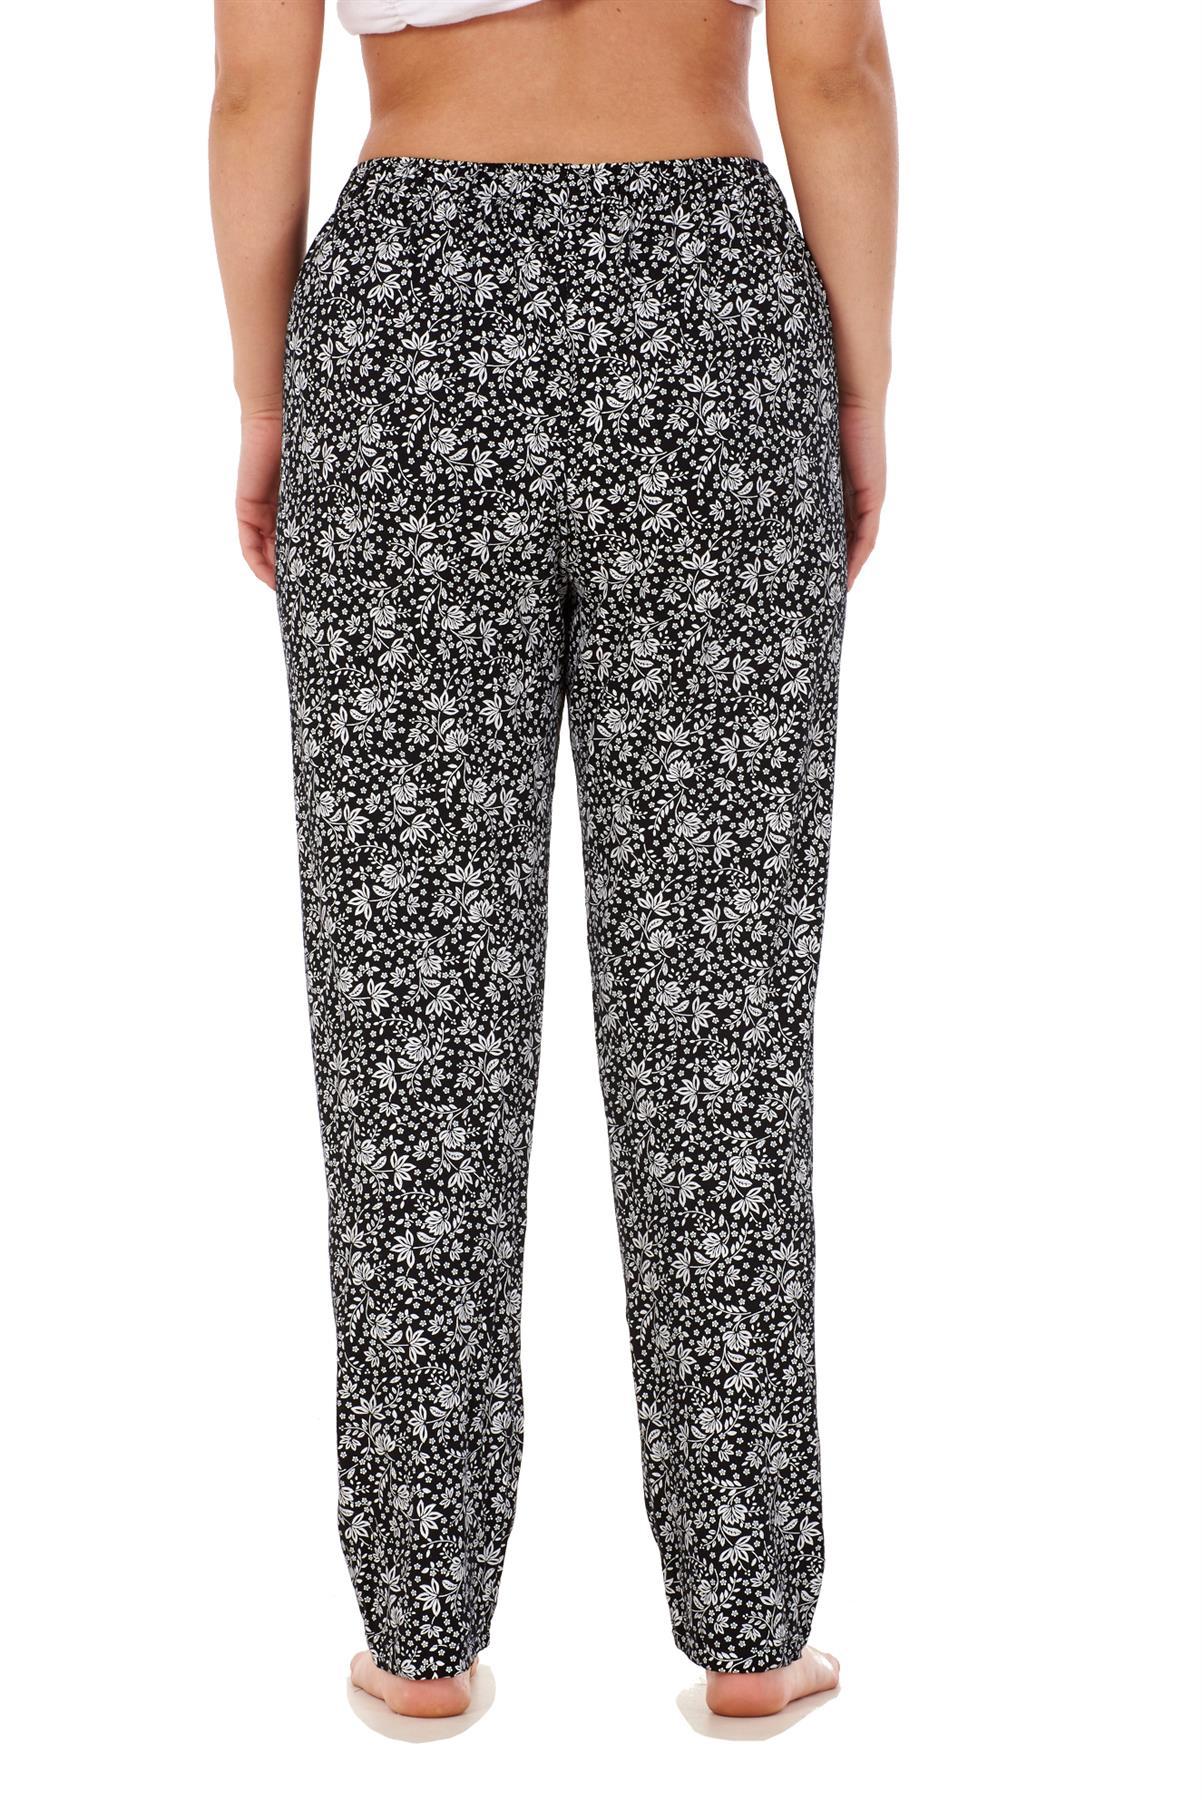 Ladies-Women-Trouser-Elasticated-Printed-Tapered-Harem-High-waist-Regular-Pants thumbnail 20